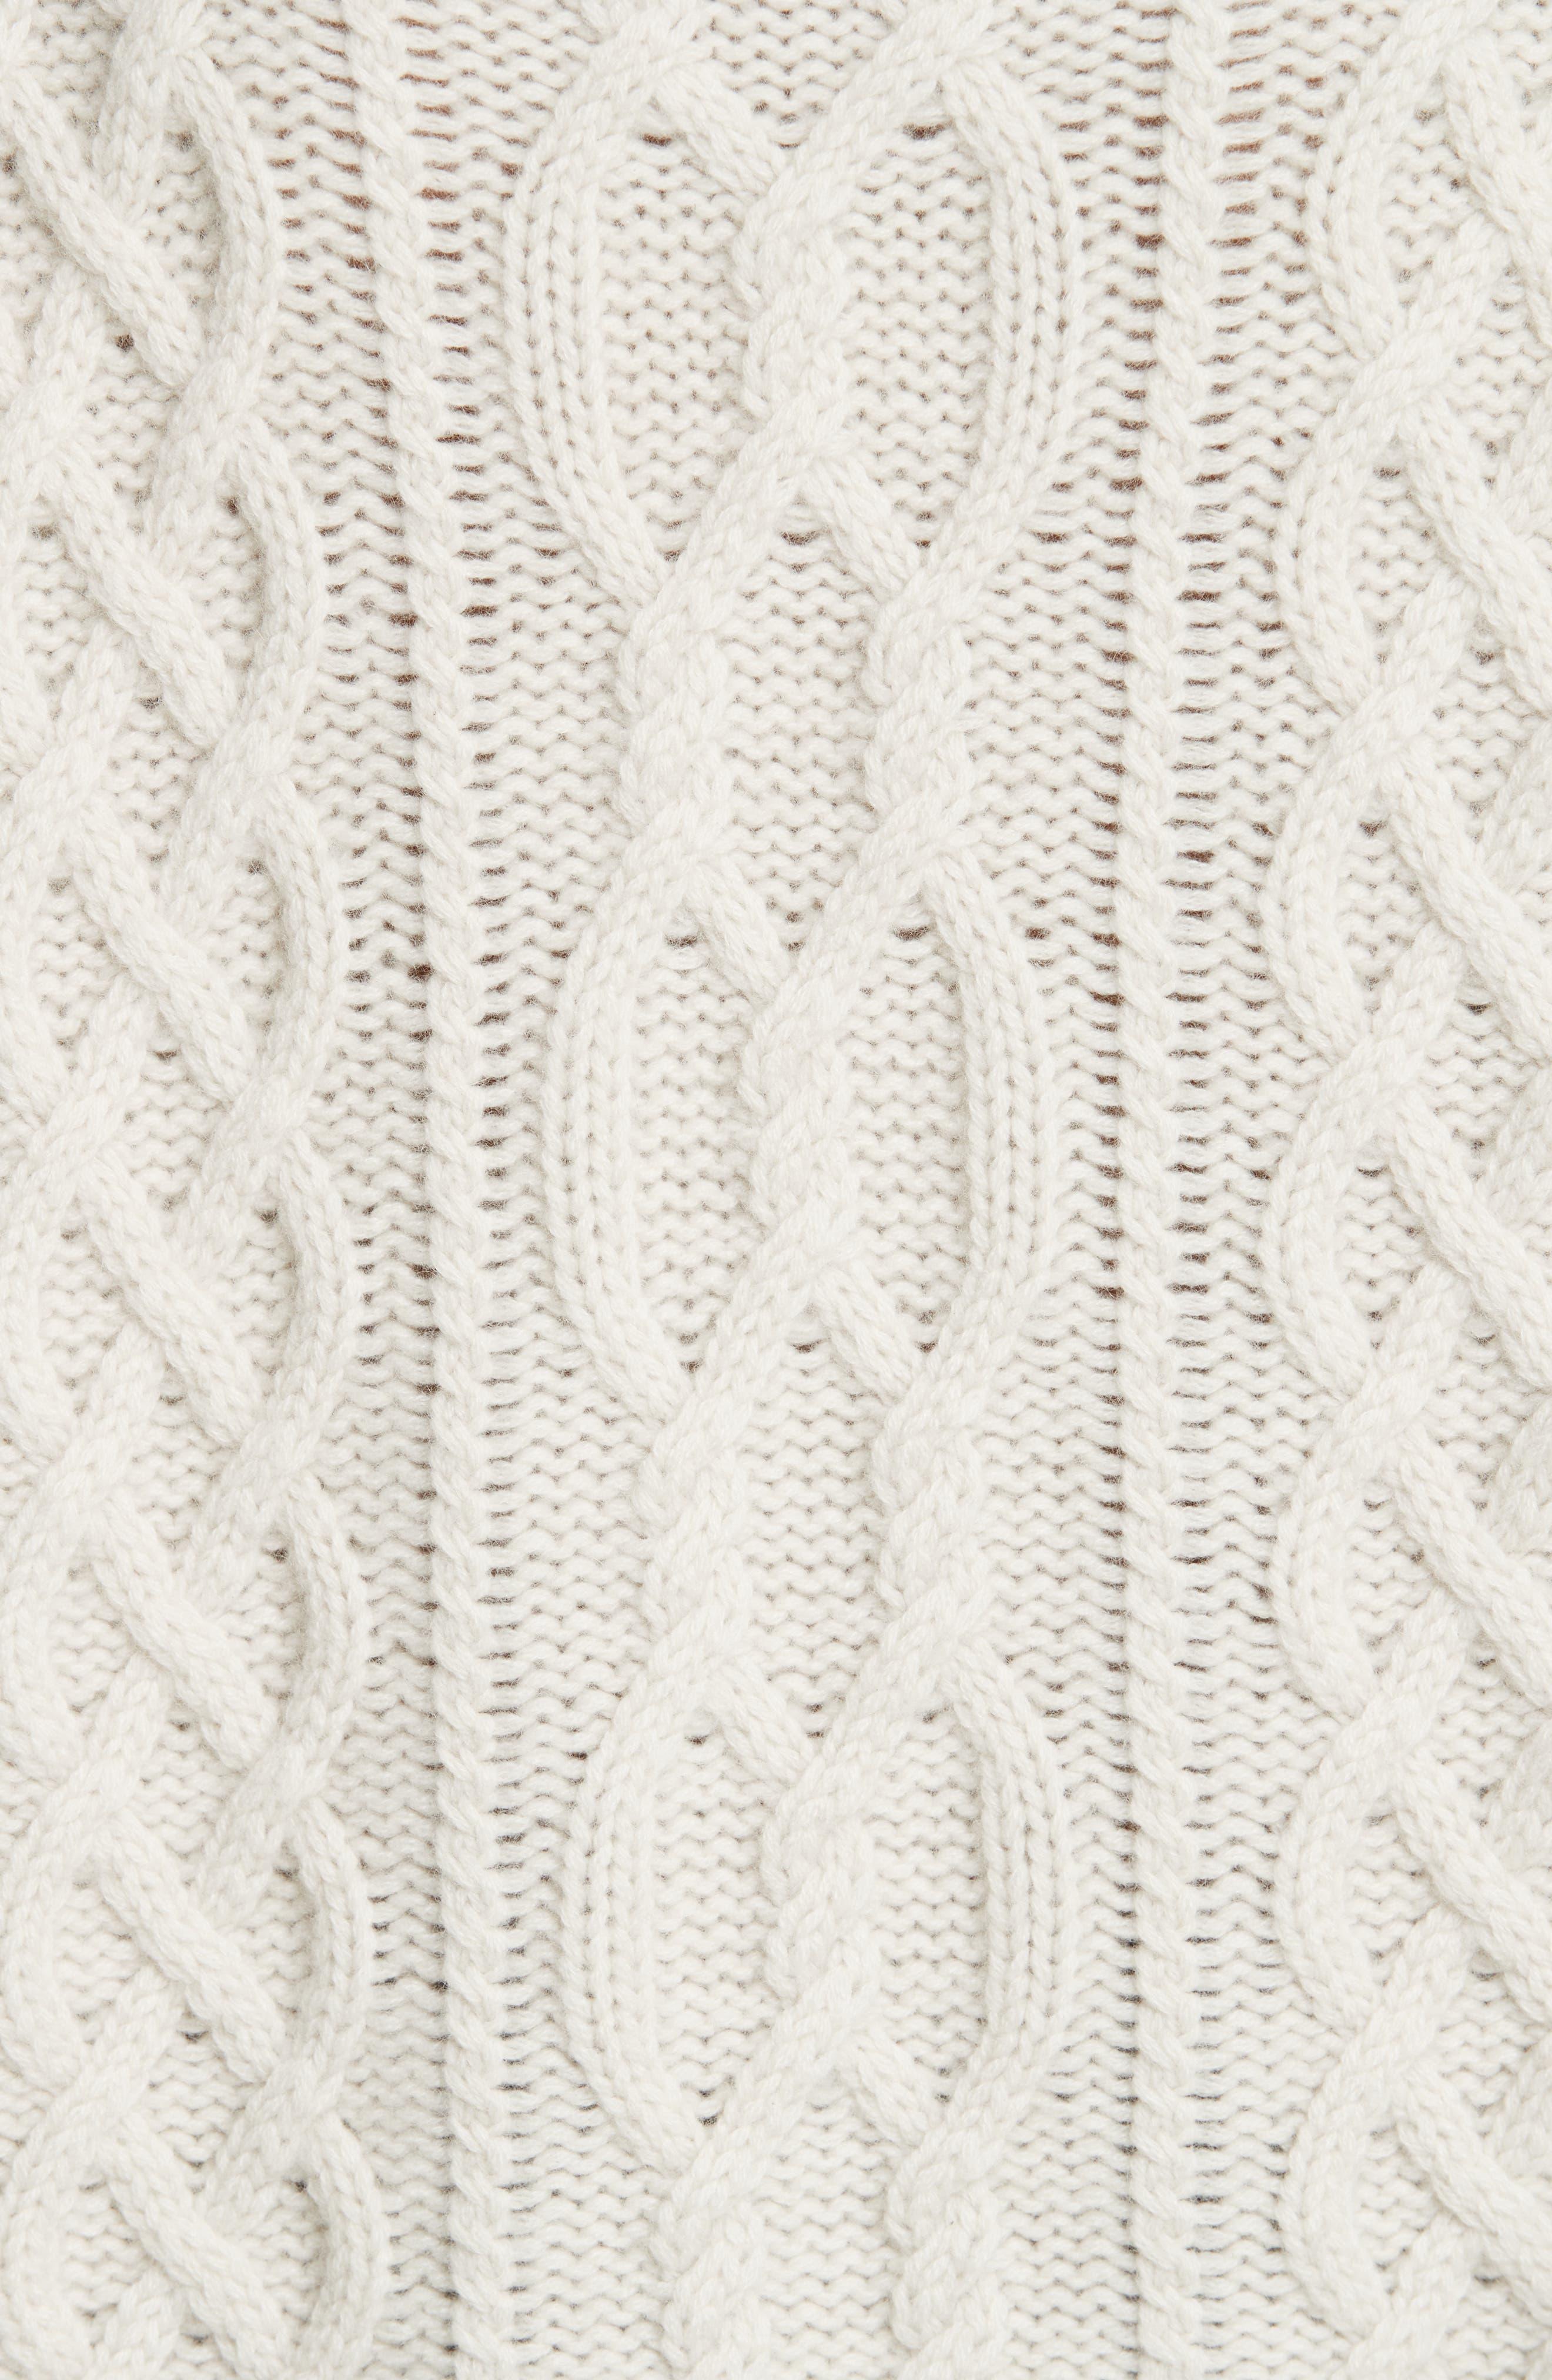 Cecil Cable Knit Cashmere Turtleneck Sweater,                             Alternate thumbnail 5, color,                             902